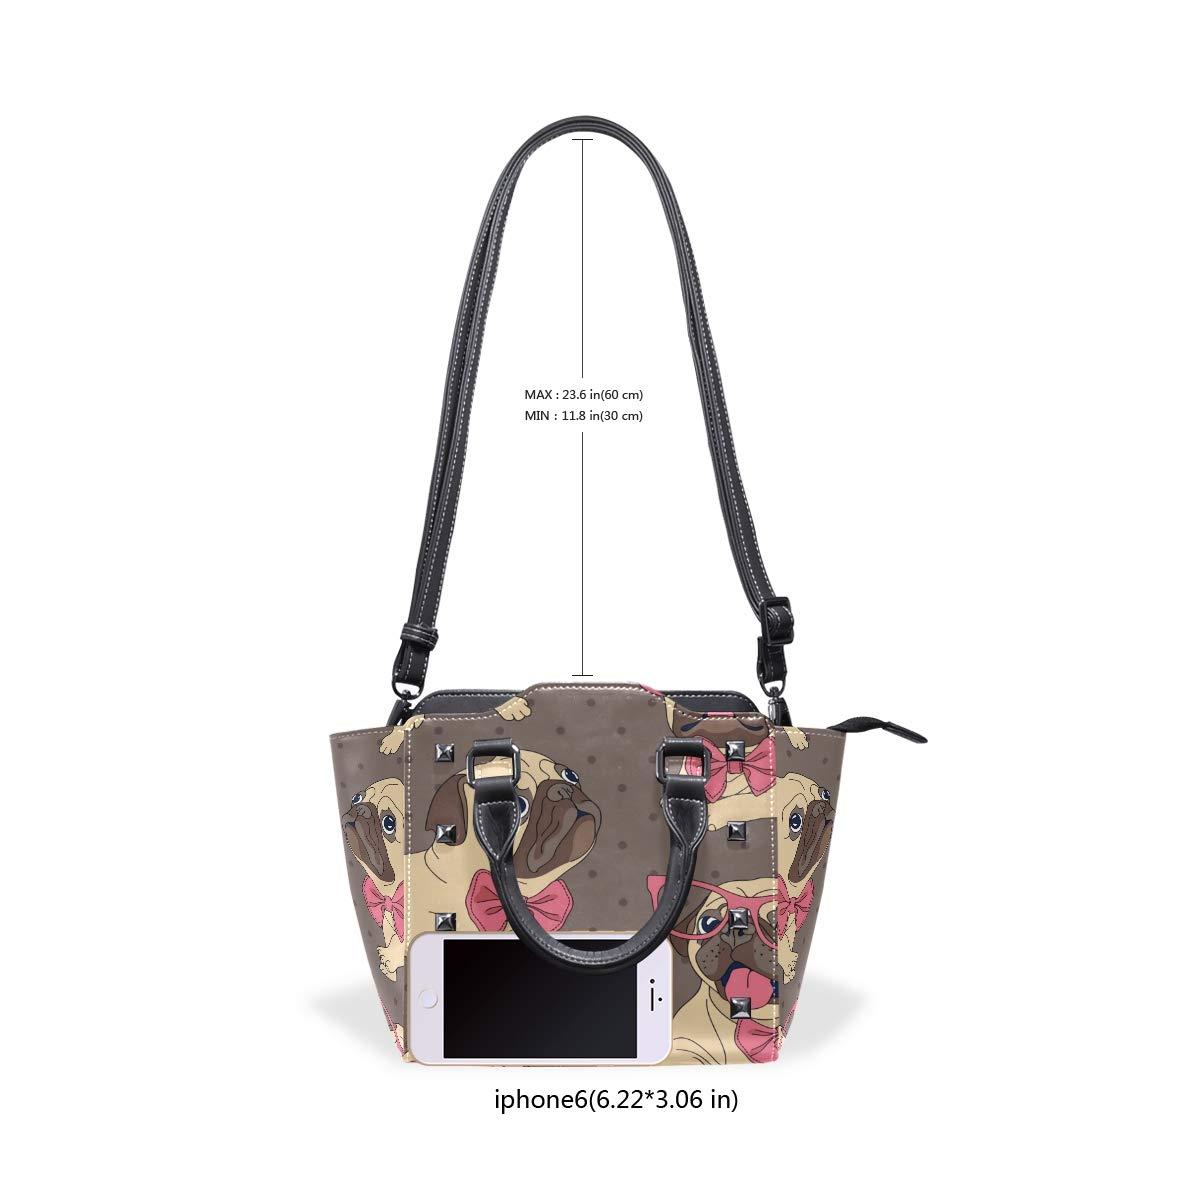 Polka Dot Dog Leather Handbags Purses Shoulder Tote Satchel Bags Womens